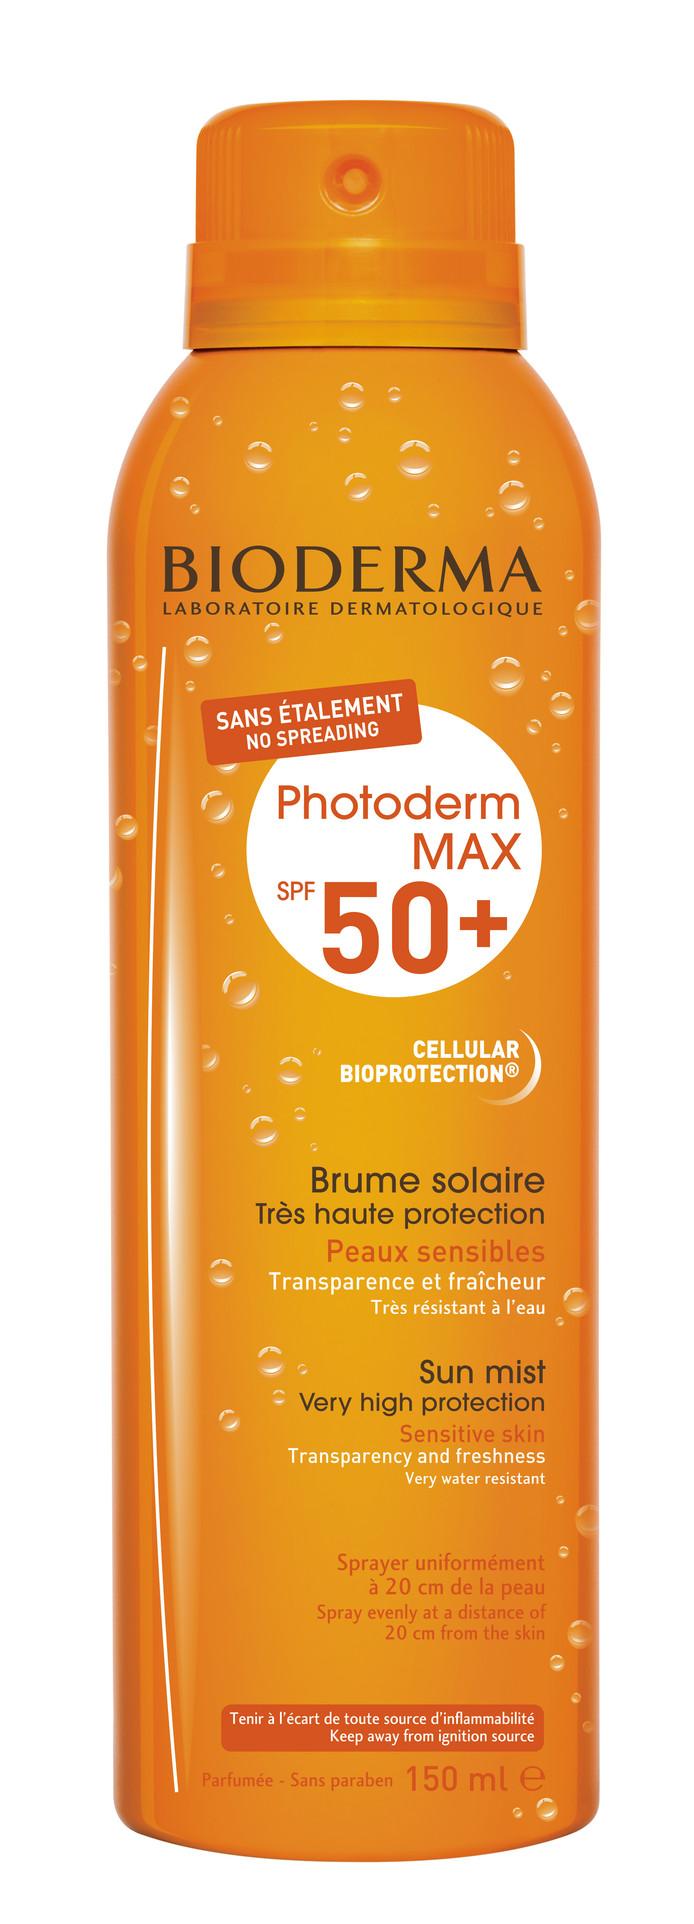 Photoderm Brum SPF50 - 24,65 euros. Disponible en pharmacie et parapharmacie.